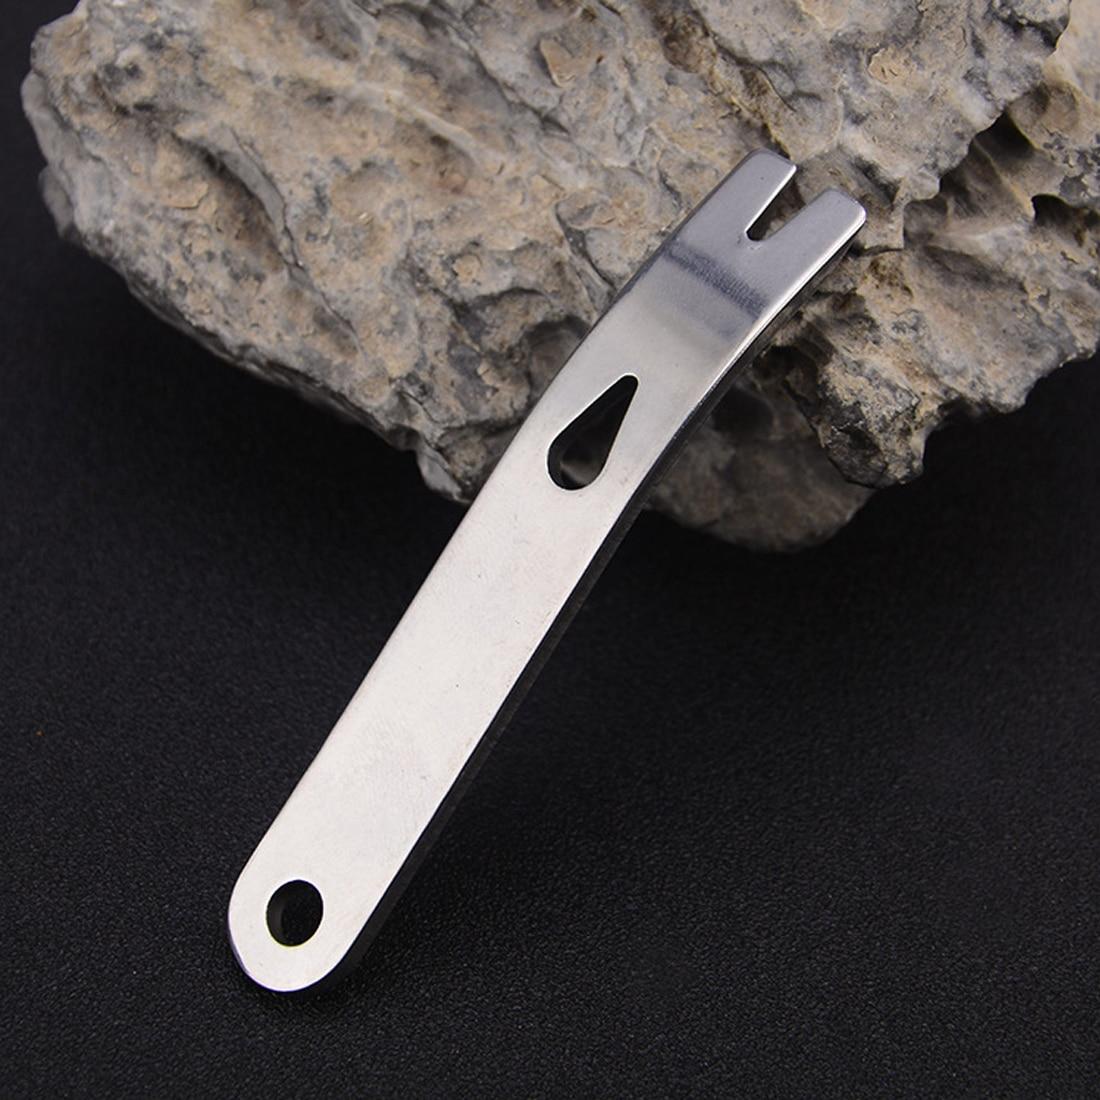 Gear Mini Crank Crowbar Pocket Pry Bar Keychain Multi Tool Survival Scraper EDC